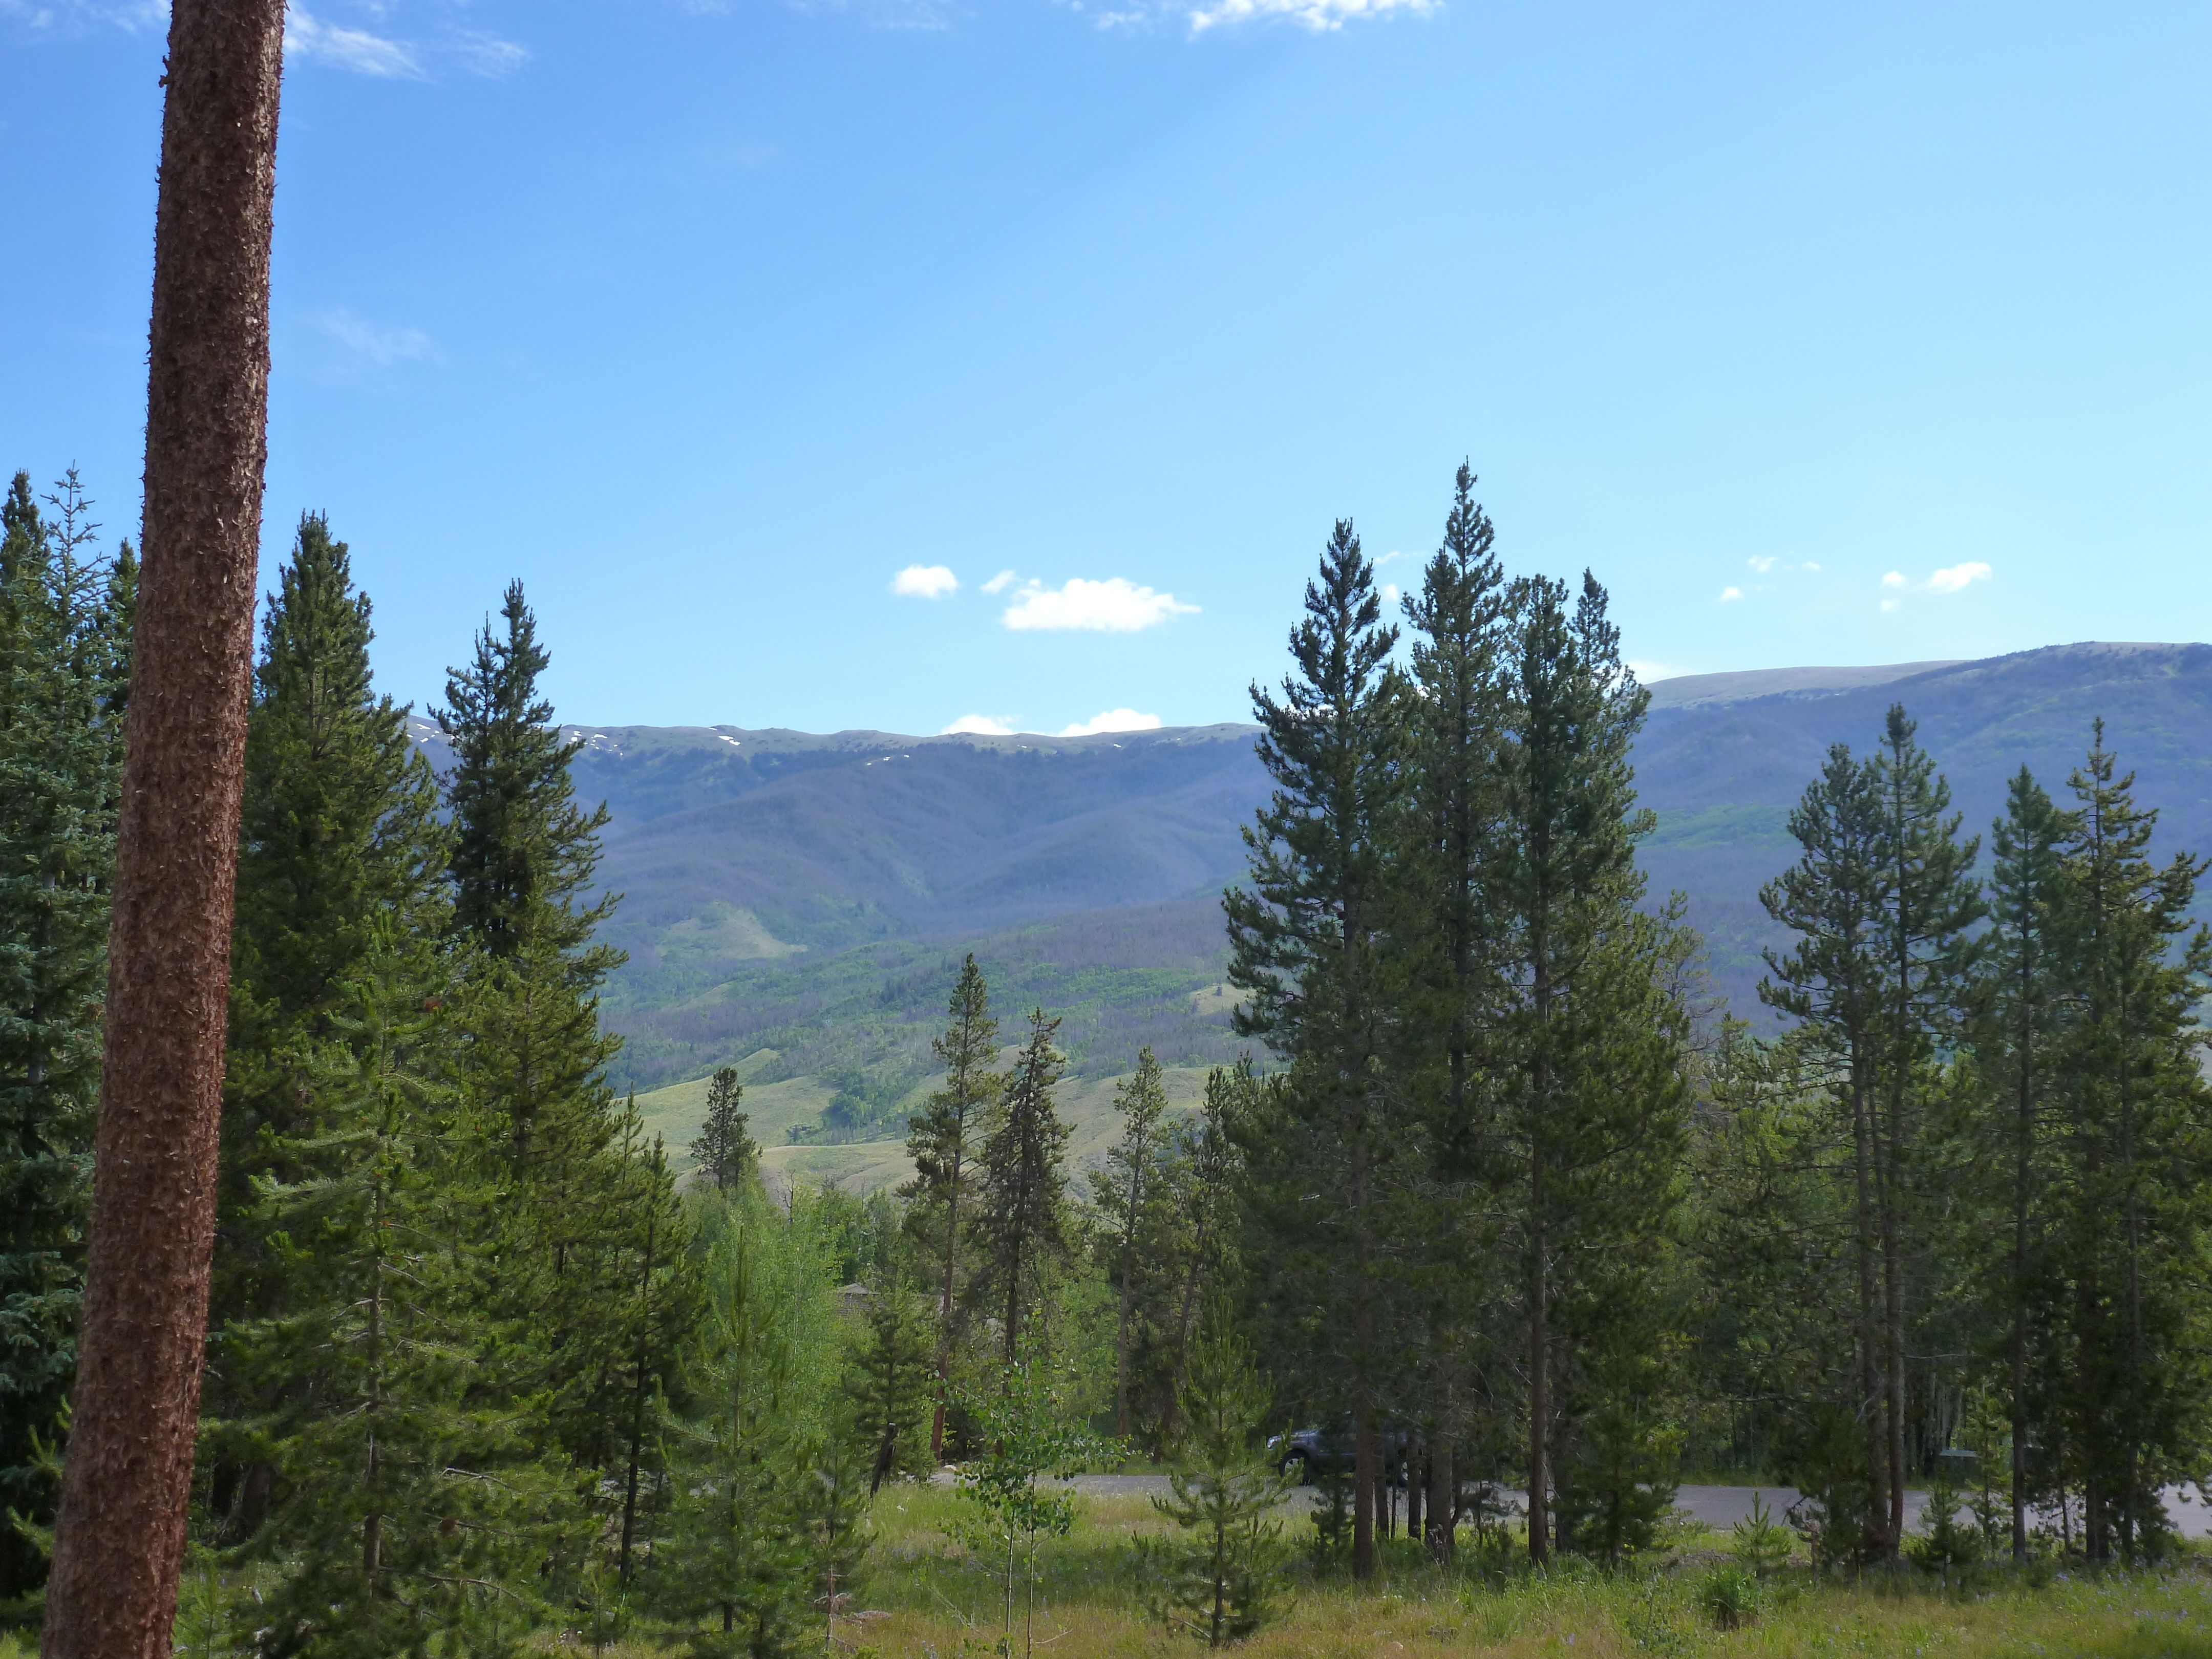 200 EASY BEND TRAIL SILVERTHORNE, Colorado 80498